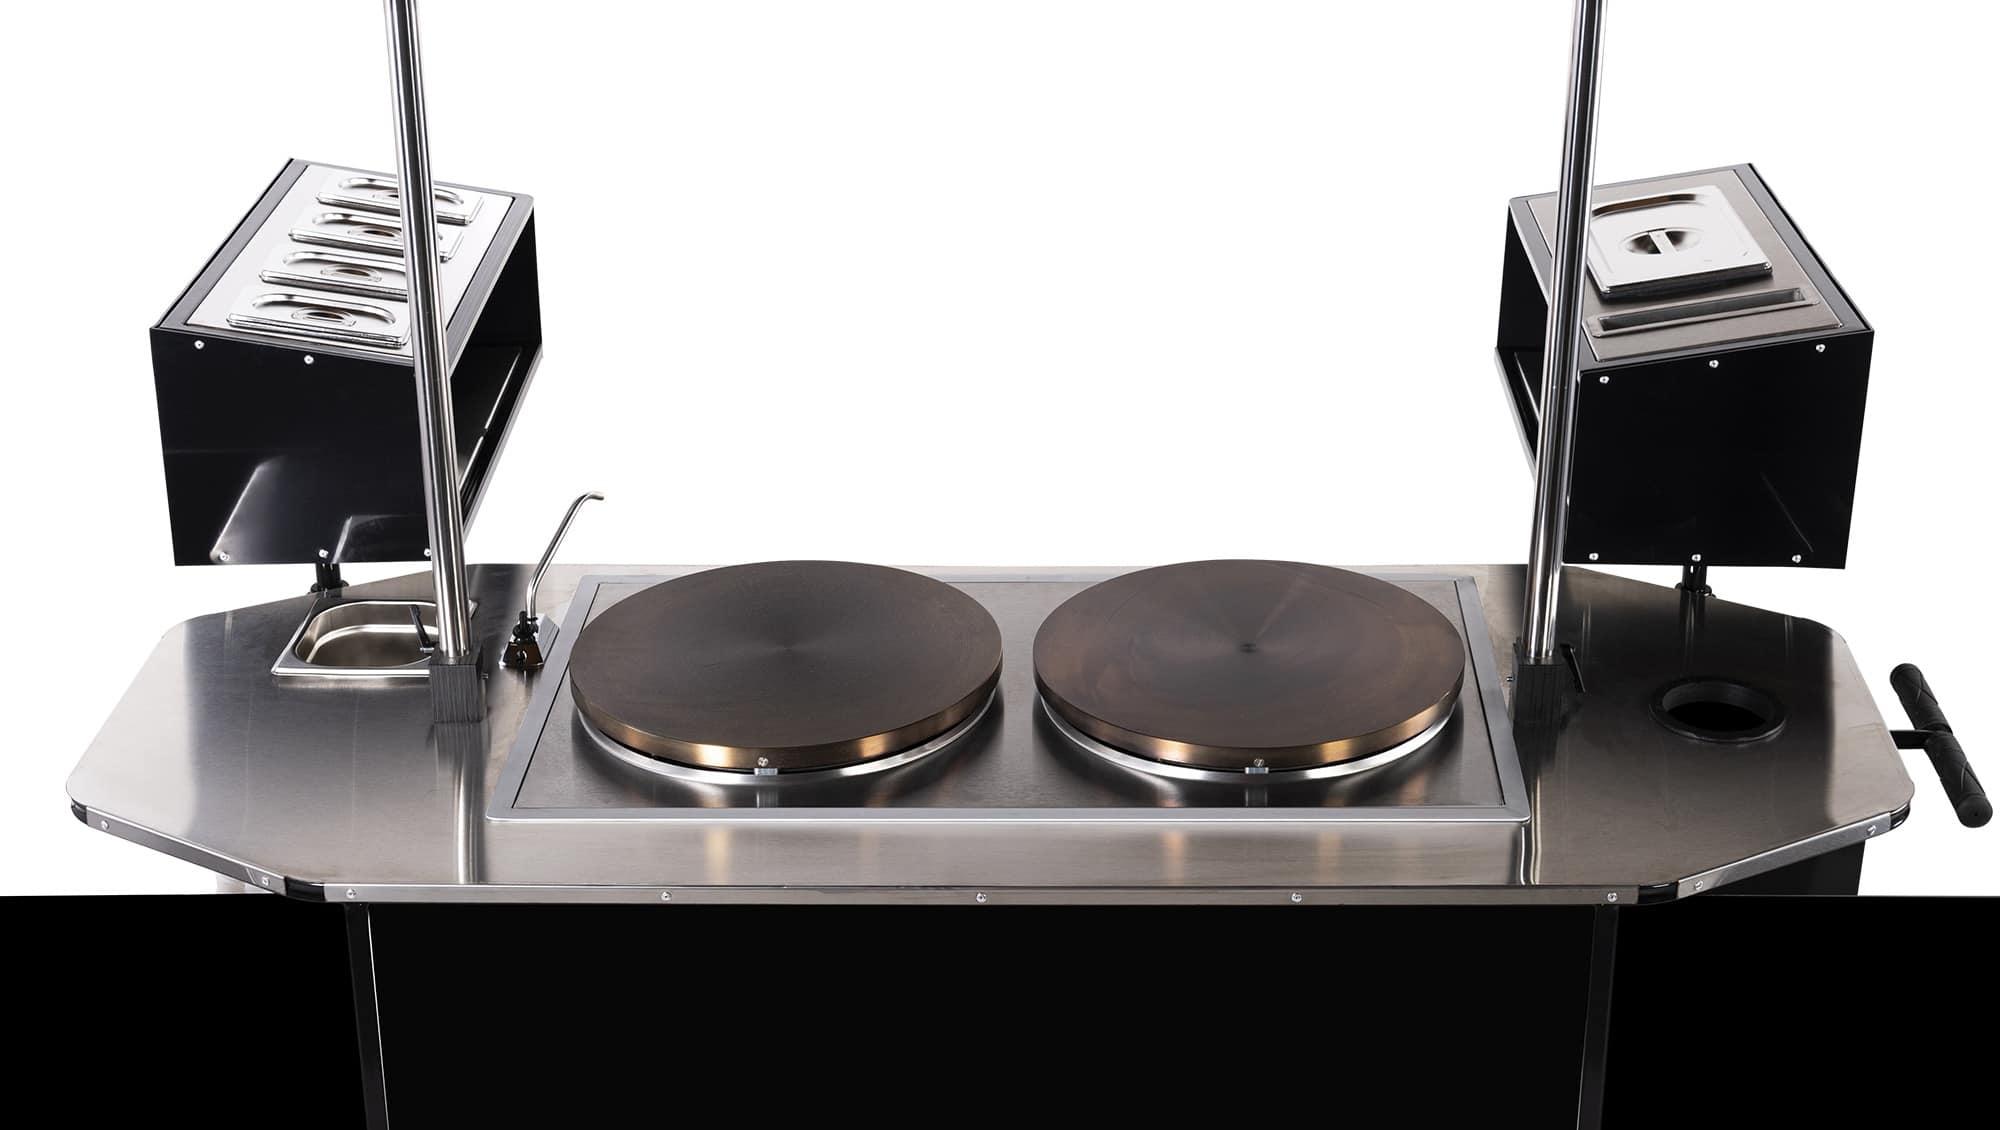 BizzOnWheels crepe cart countertop equipment and features